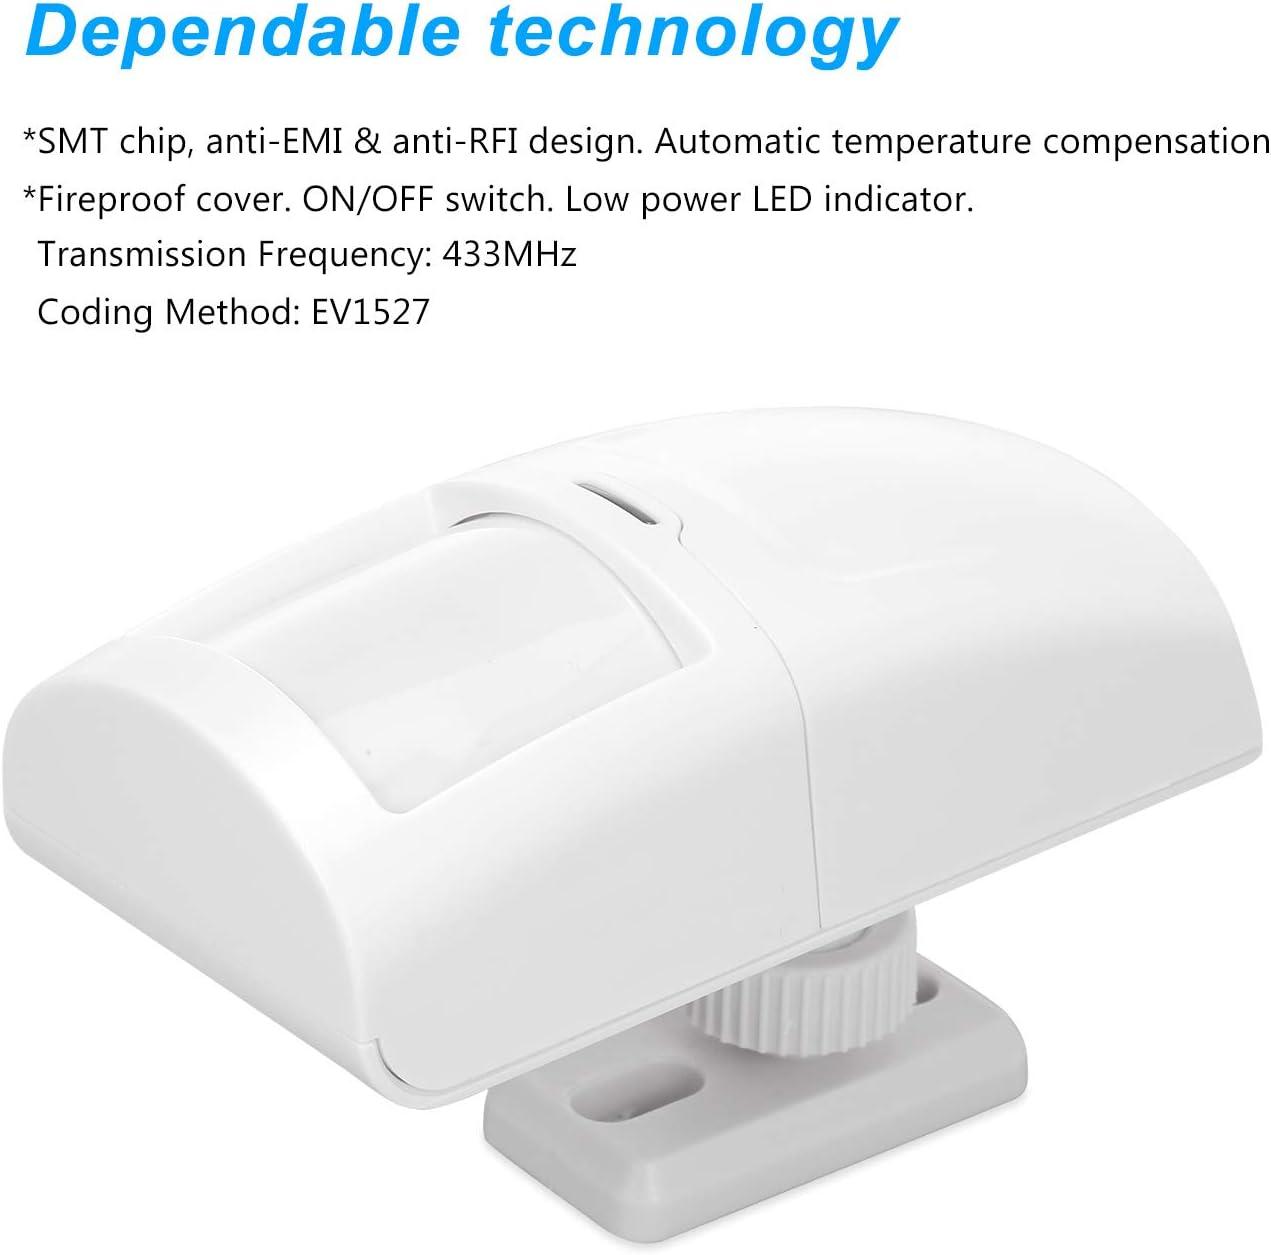 OWSOO 433MHz Sensores de Movimiento PIR Inal/ámbrico Anti-Pet 15KG Mascota Inmune Detector Infrarrojo Pasivo Dual para Sistema de Alarma